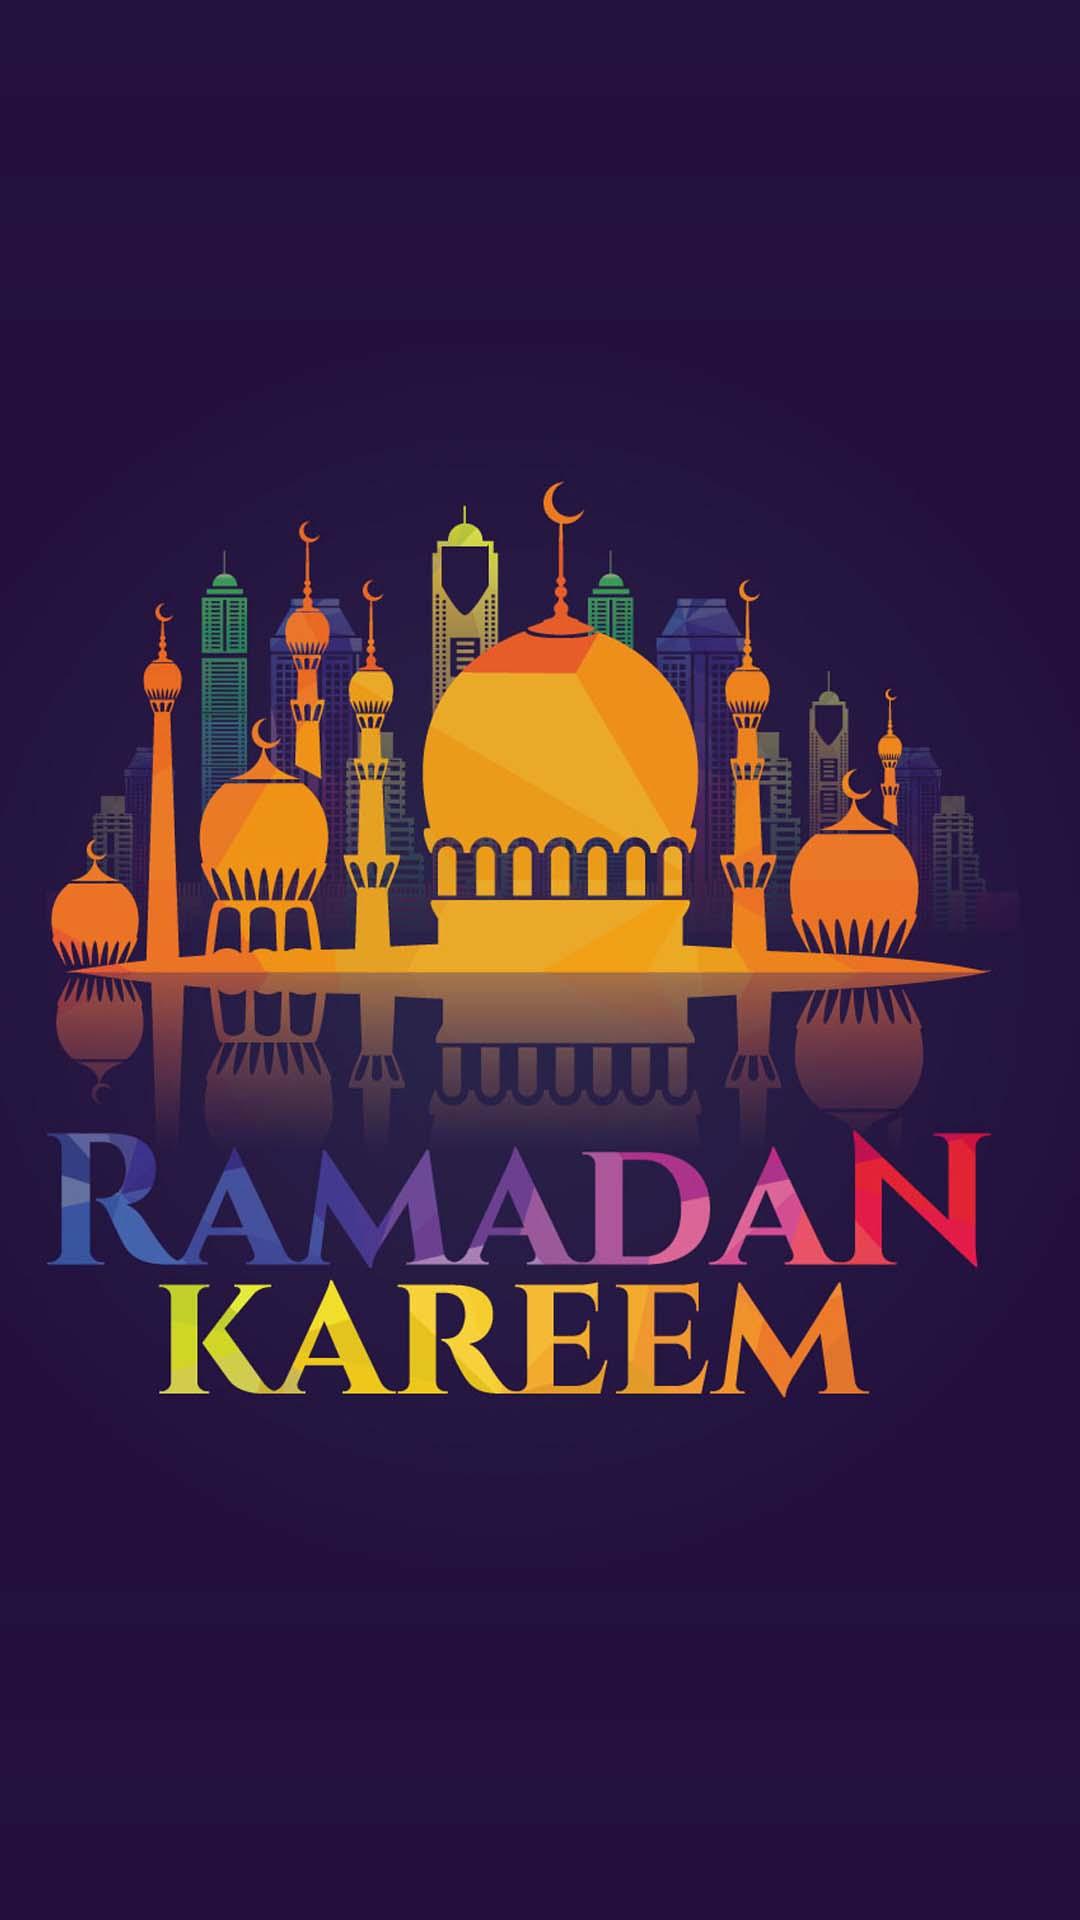 خلفيات موبايل رمضان كريم Mobile Wallpapers HD 3 خلفيات موبايل رمضان كريم Mobile Wallpapers HD